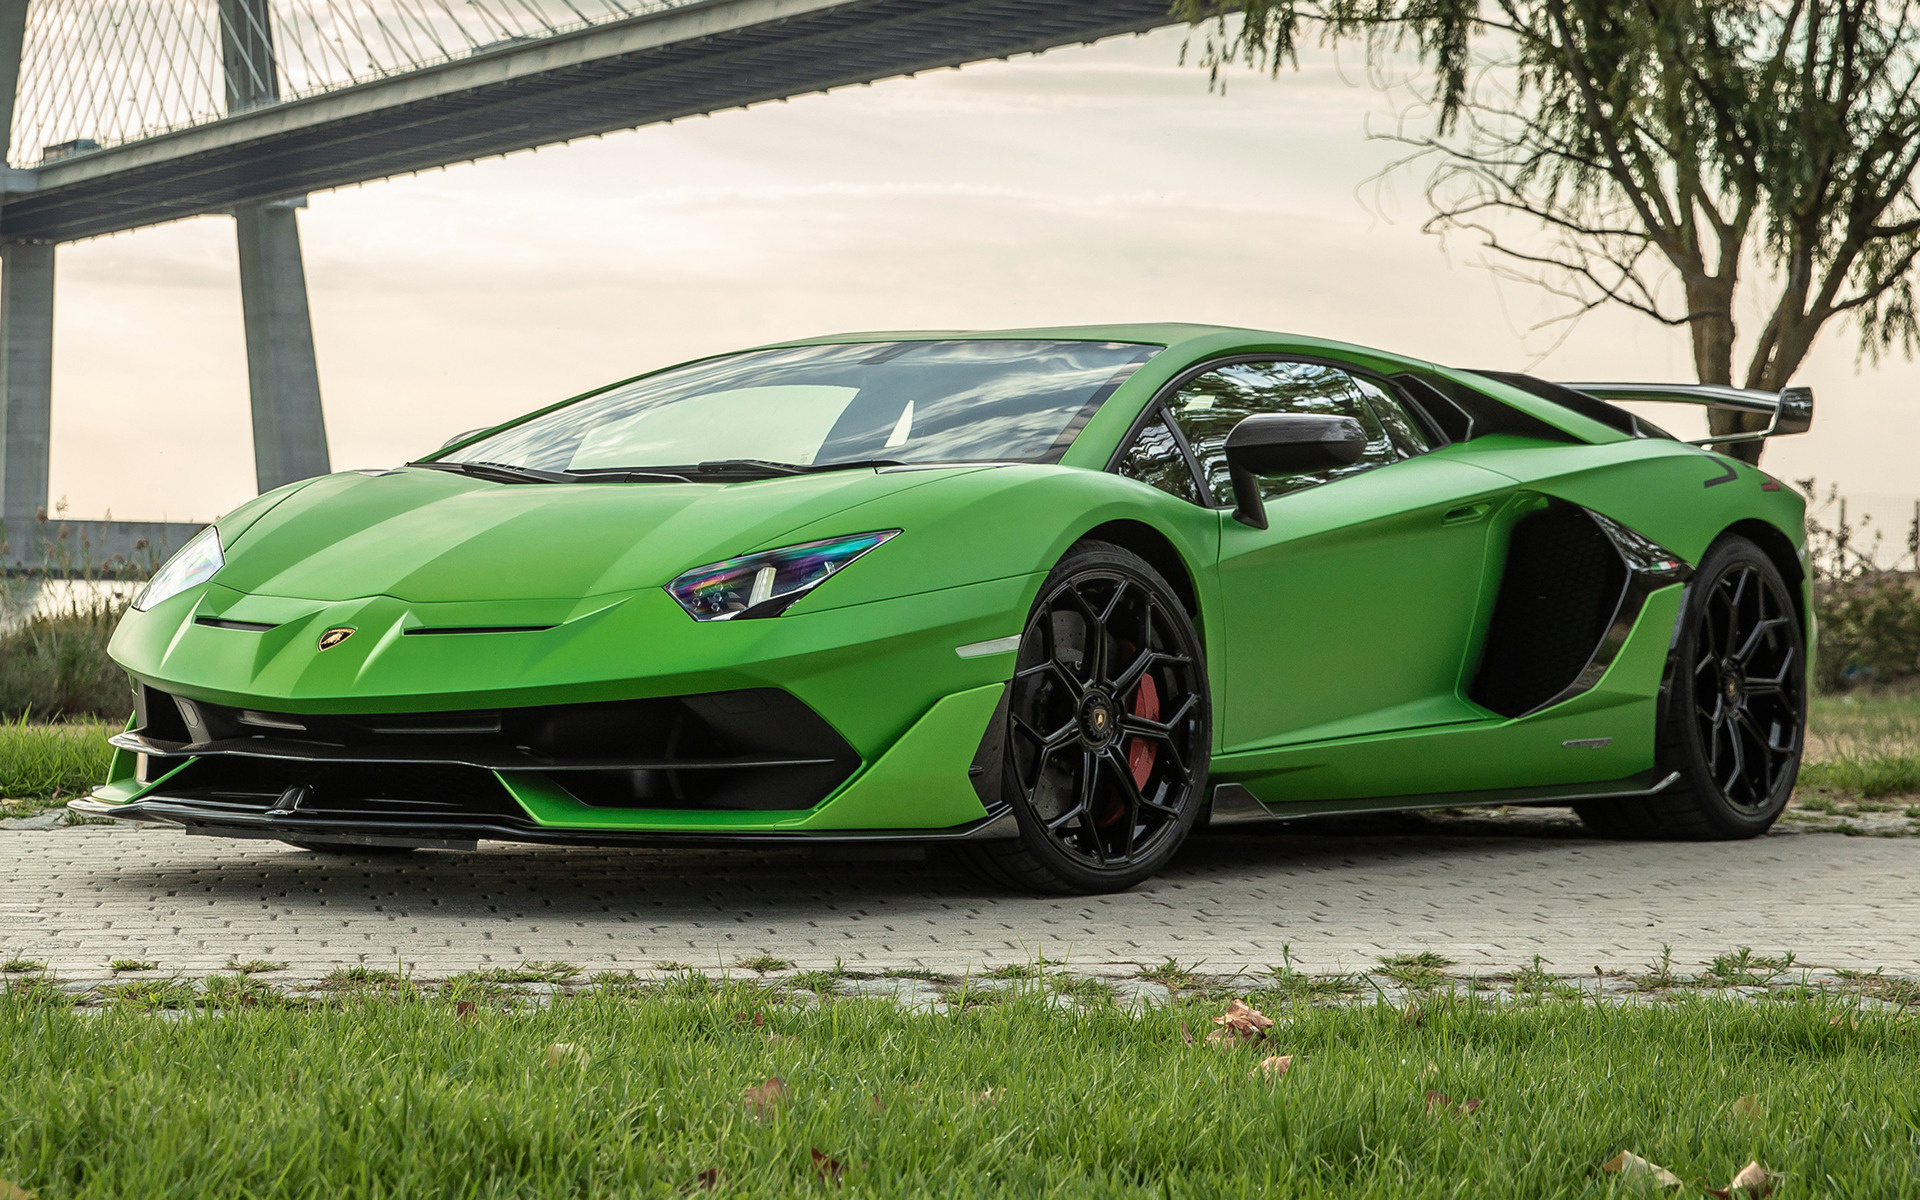 2018 Lamborghini Aventador SVJ - Wallpapers and HD Images ...